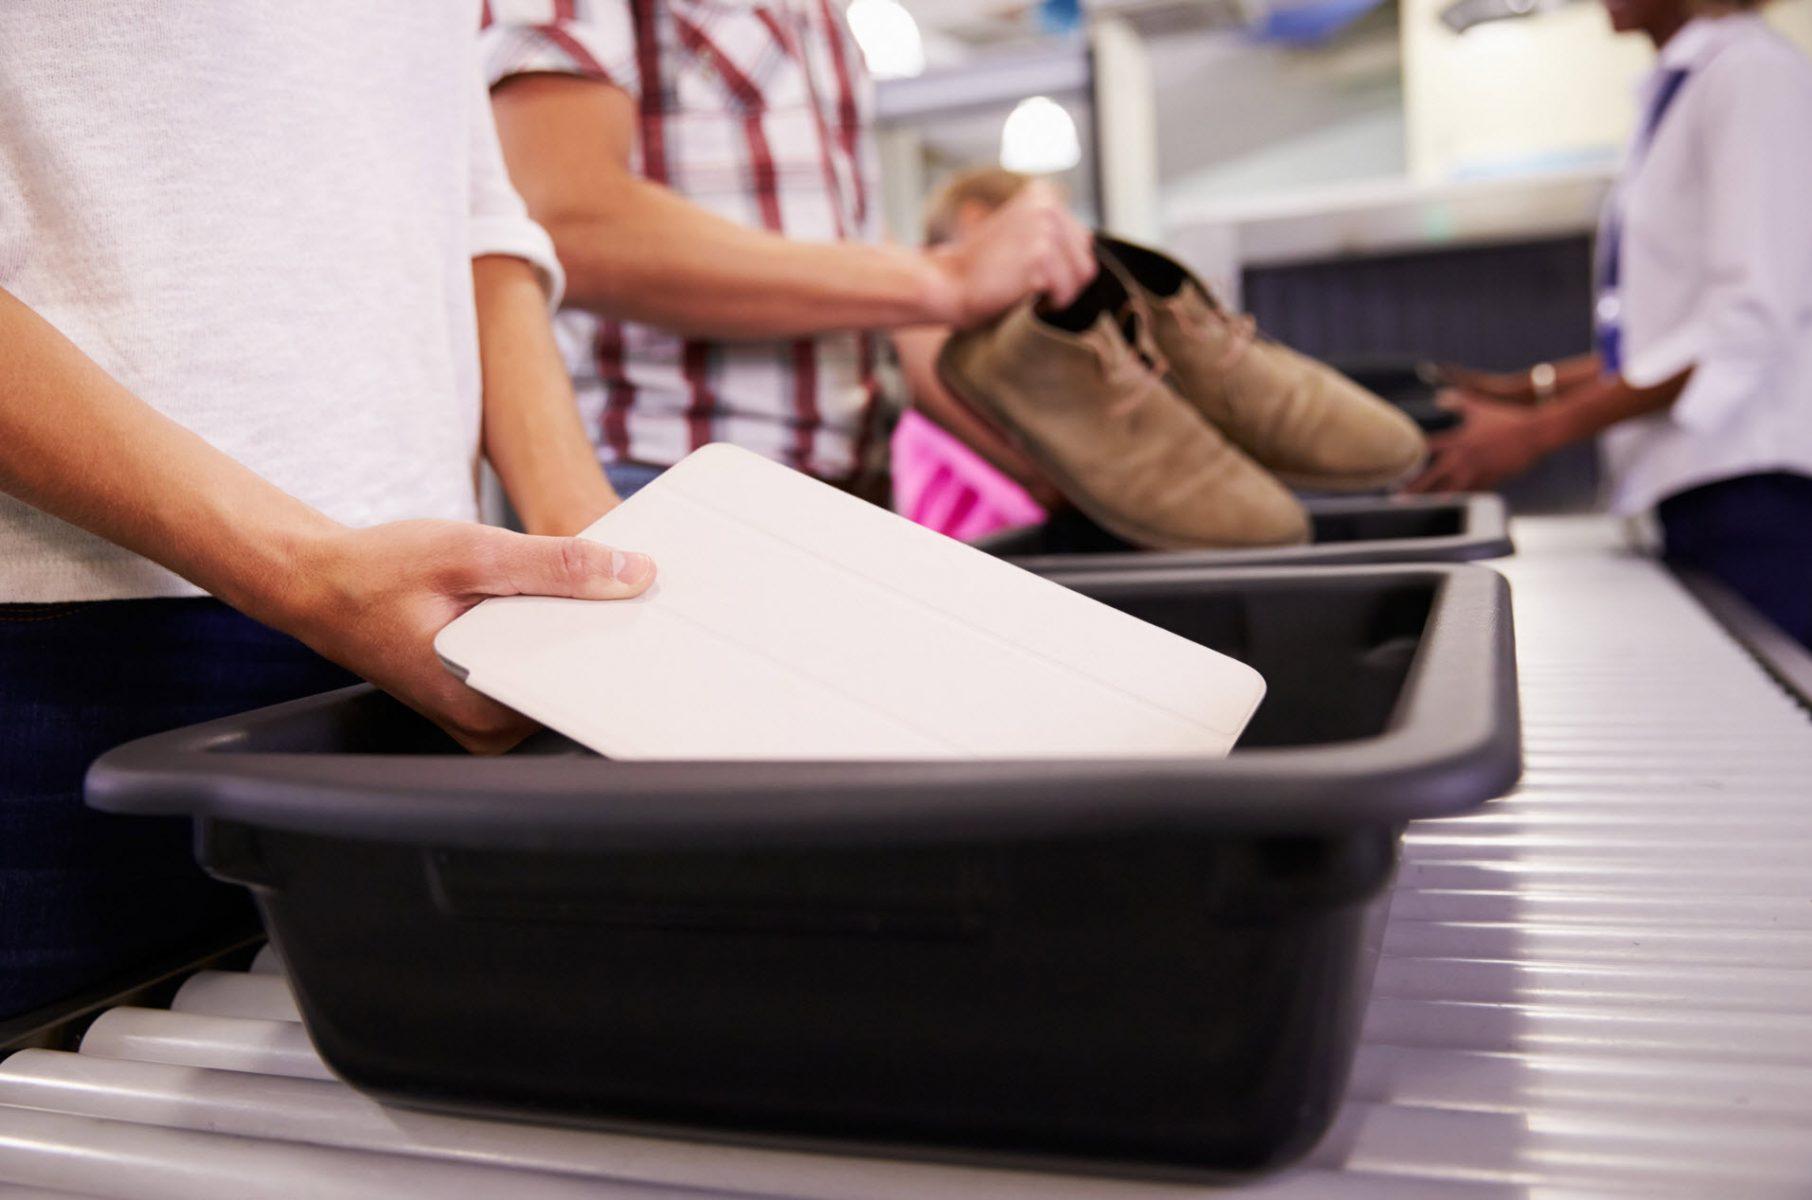 Reduce Your Chances of Contracting Pinkeye With TSA PreCheck